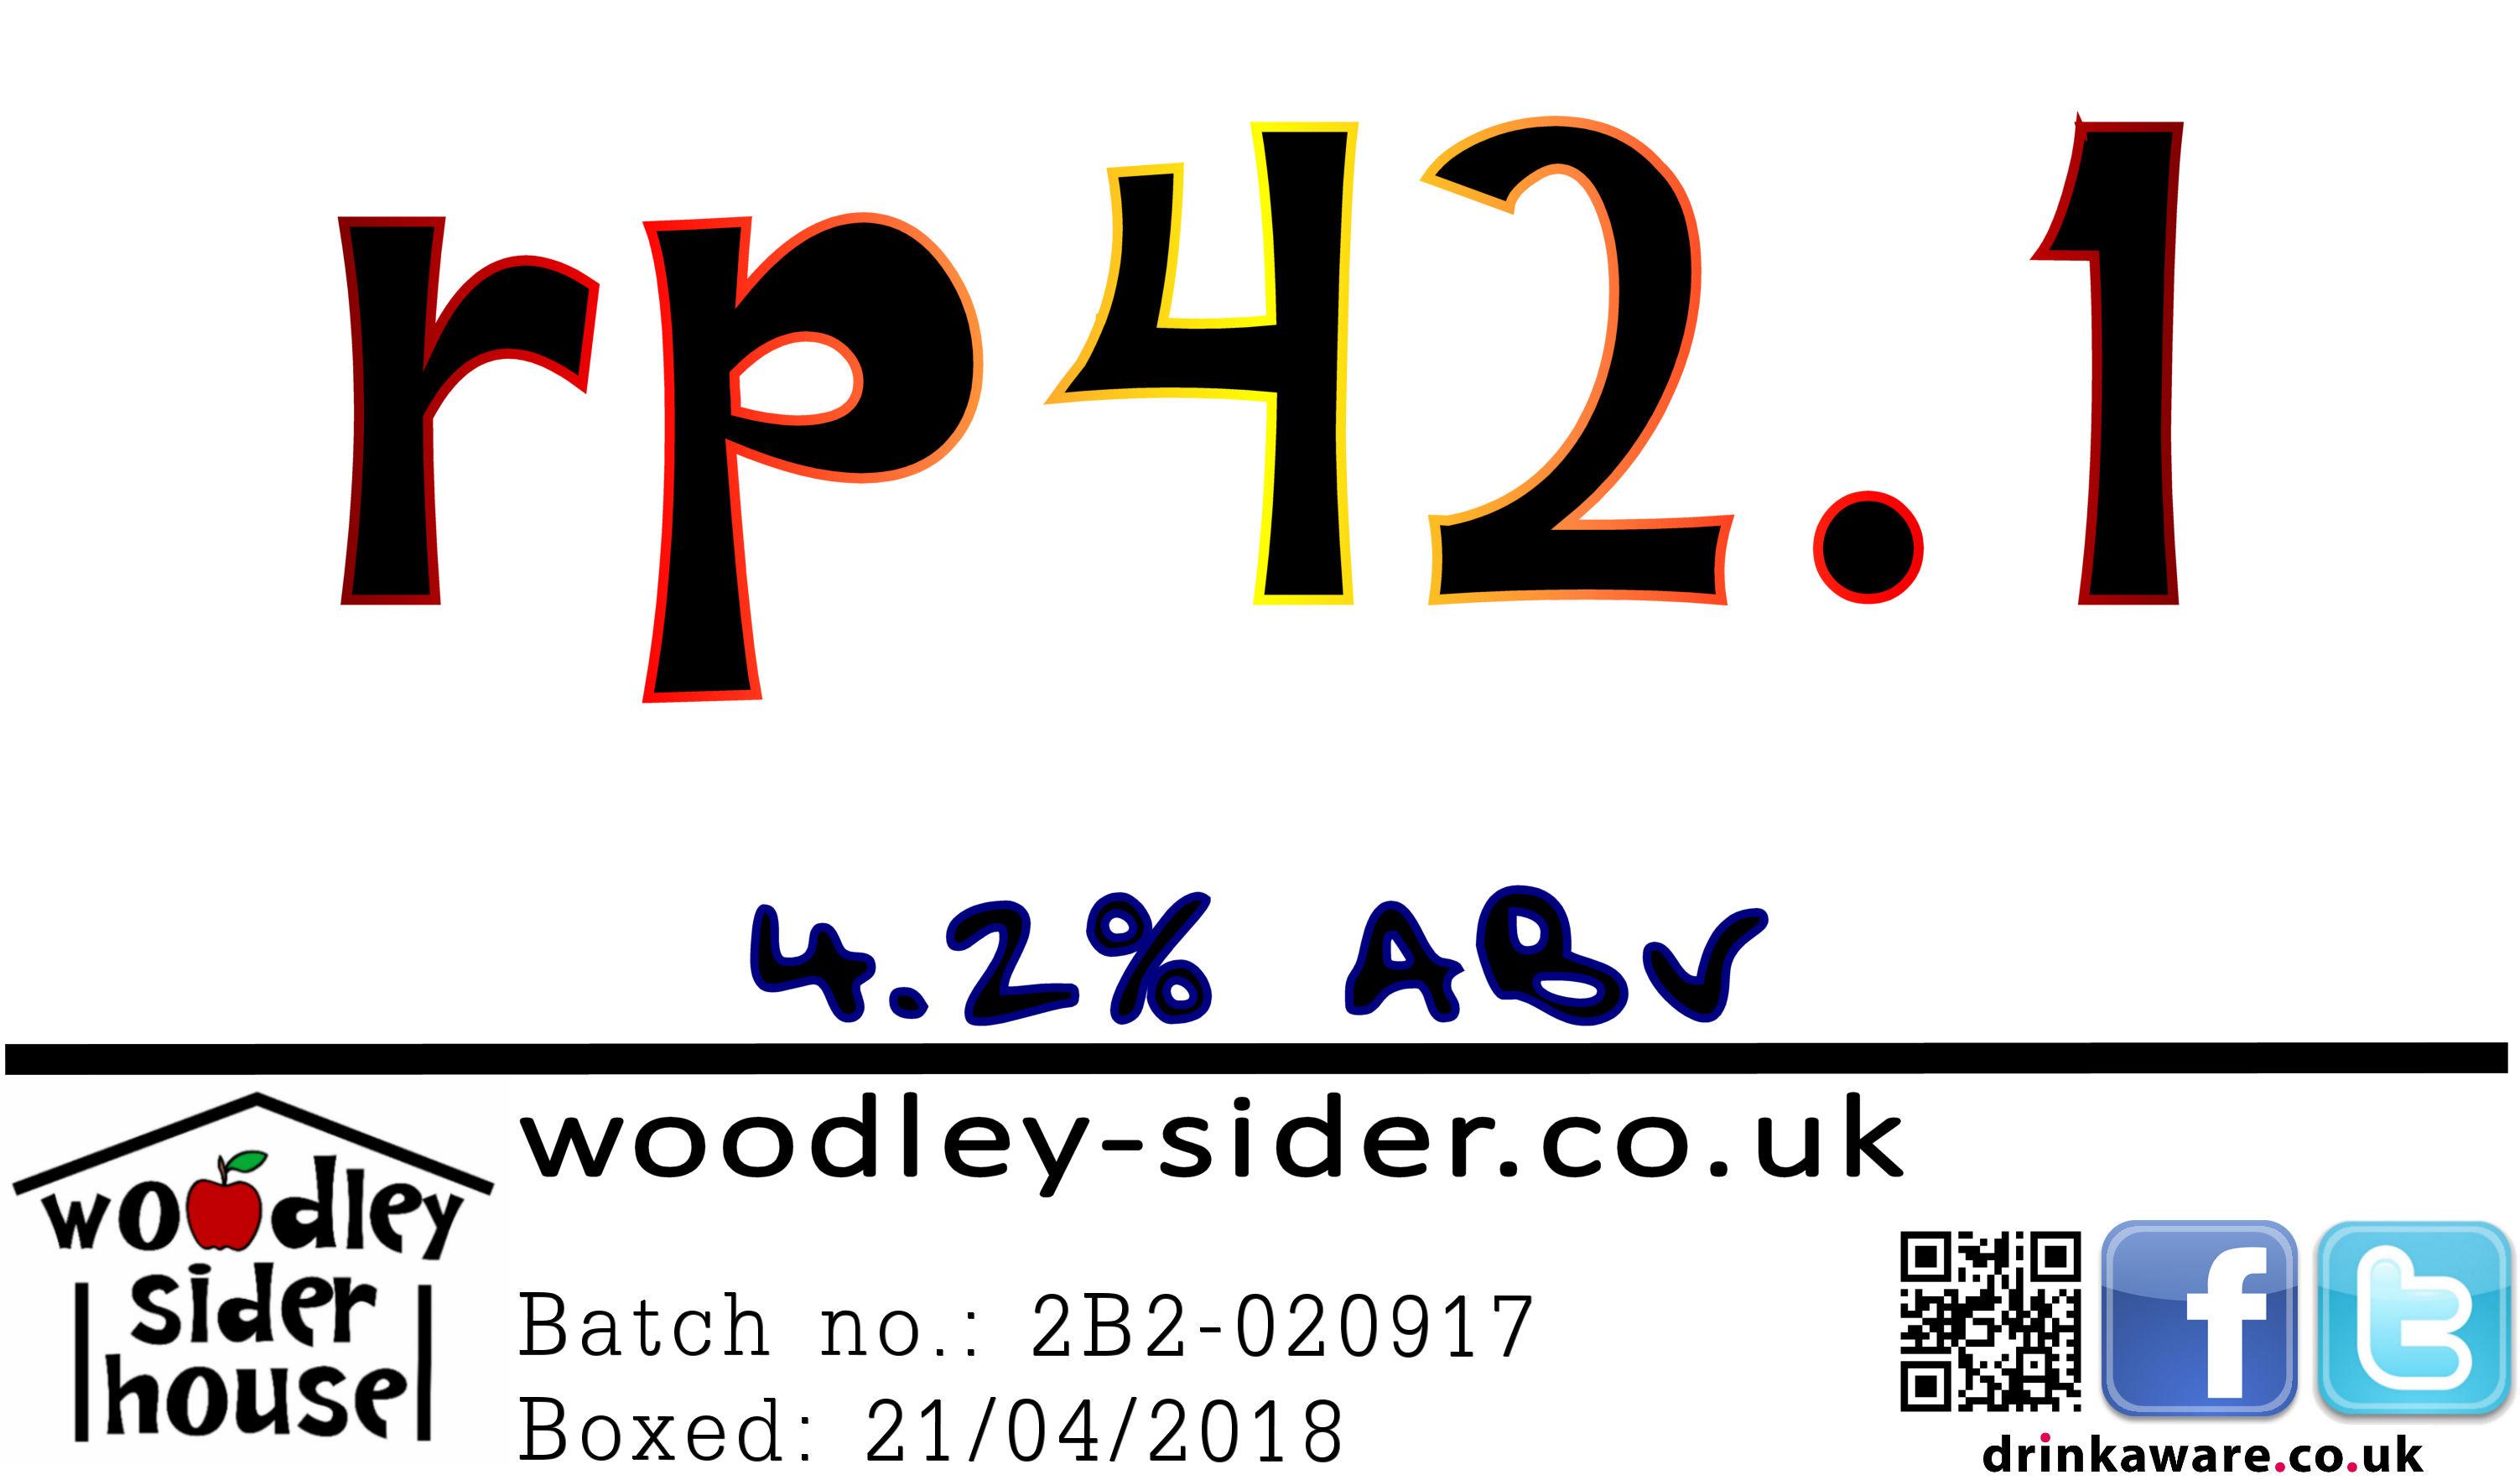 RP42.1